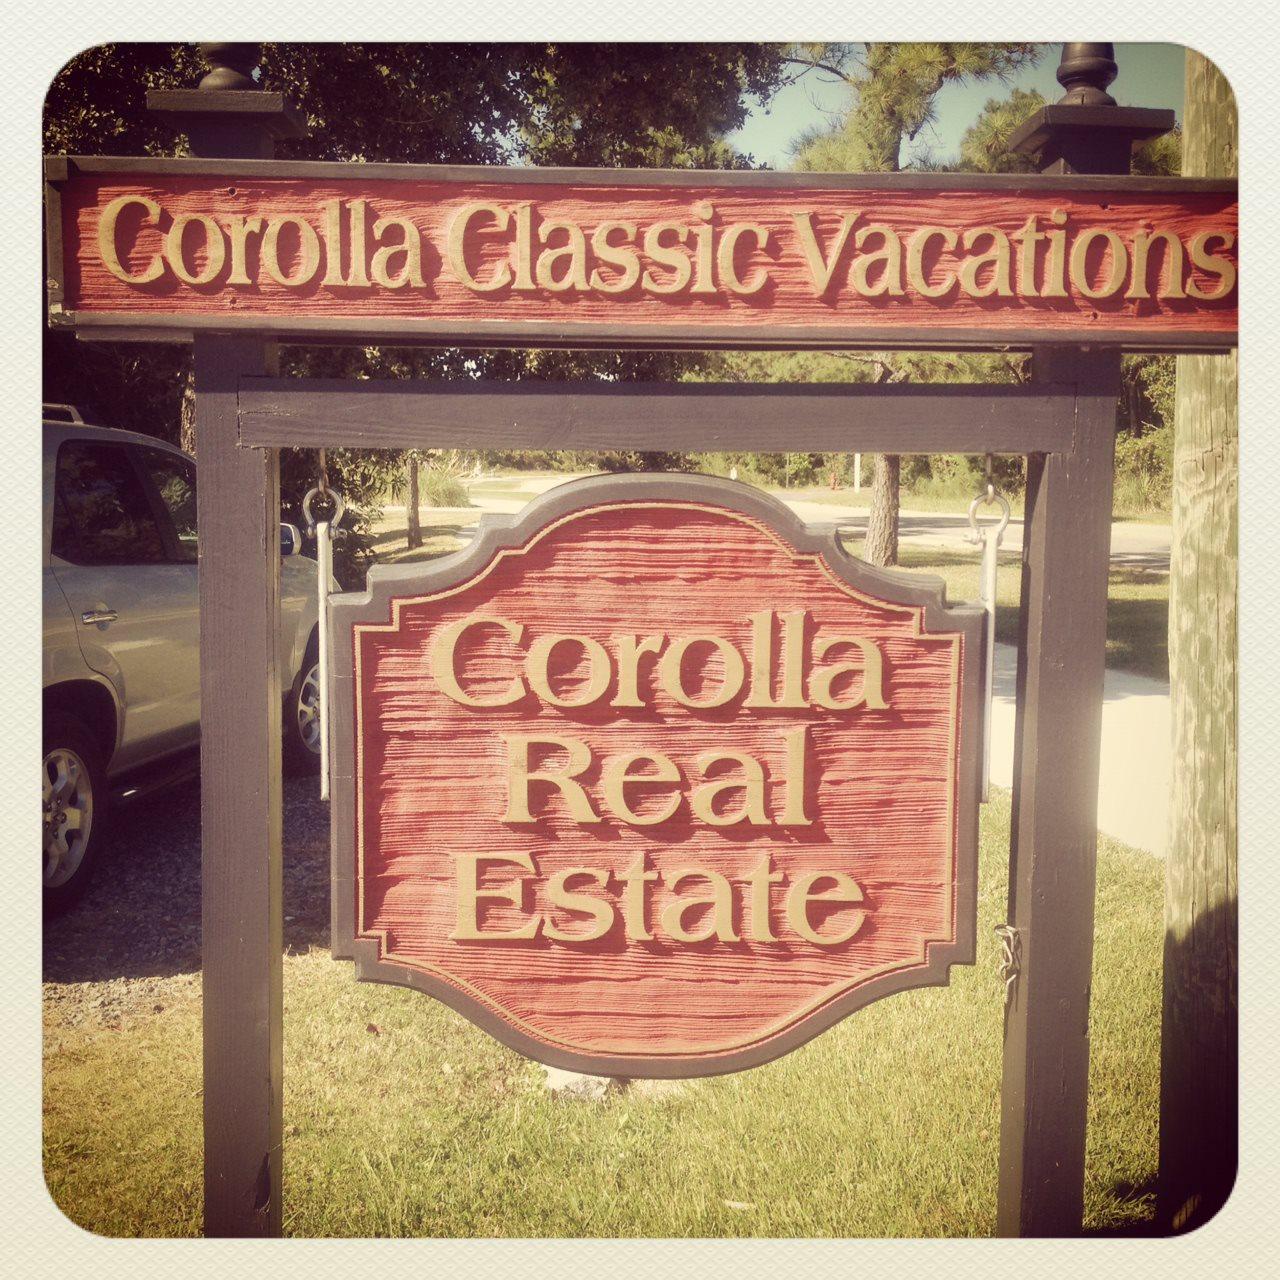 Corolla Classic Vacations in Corolla NC